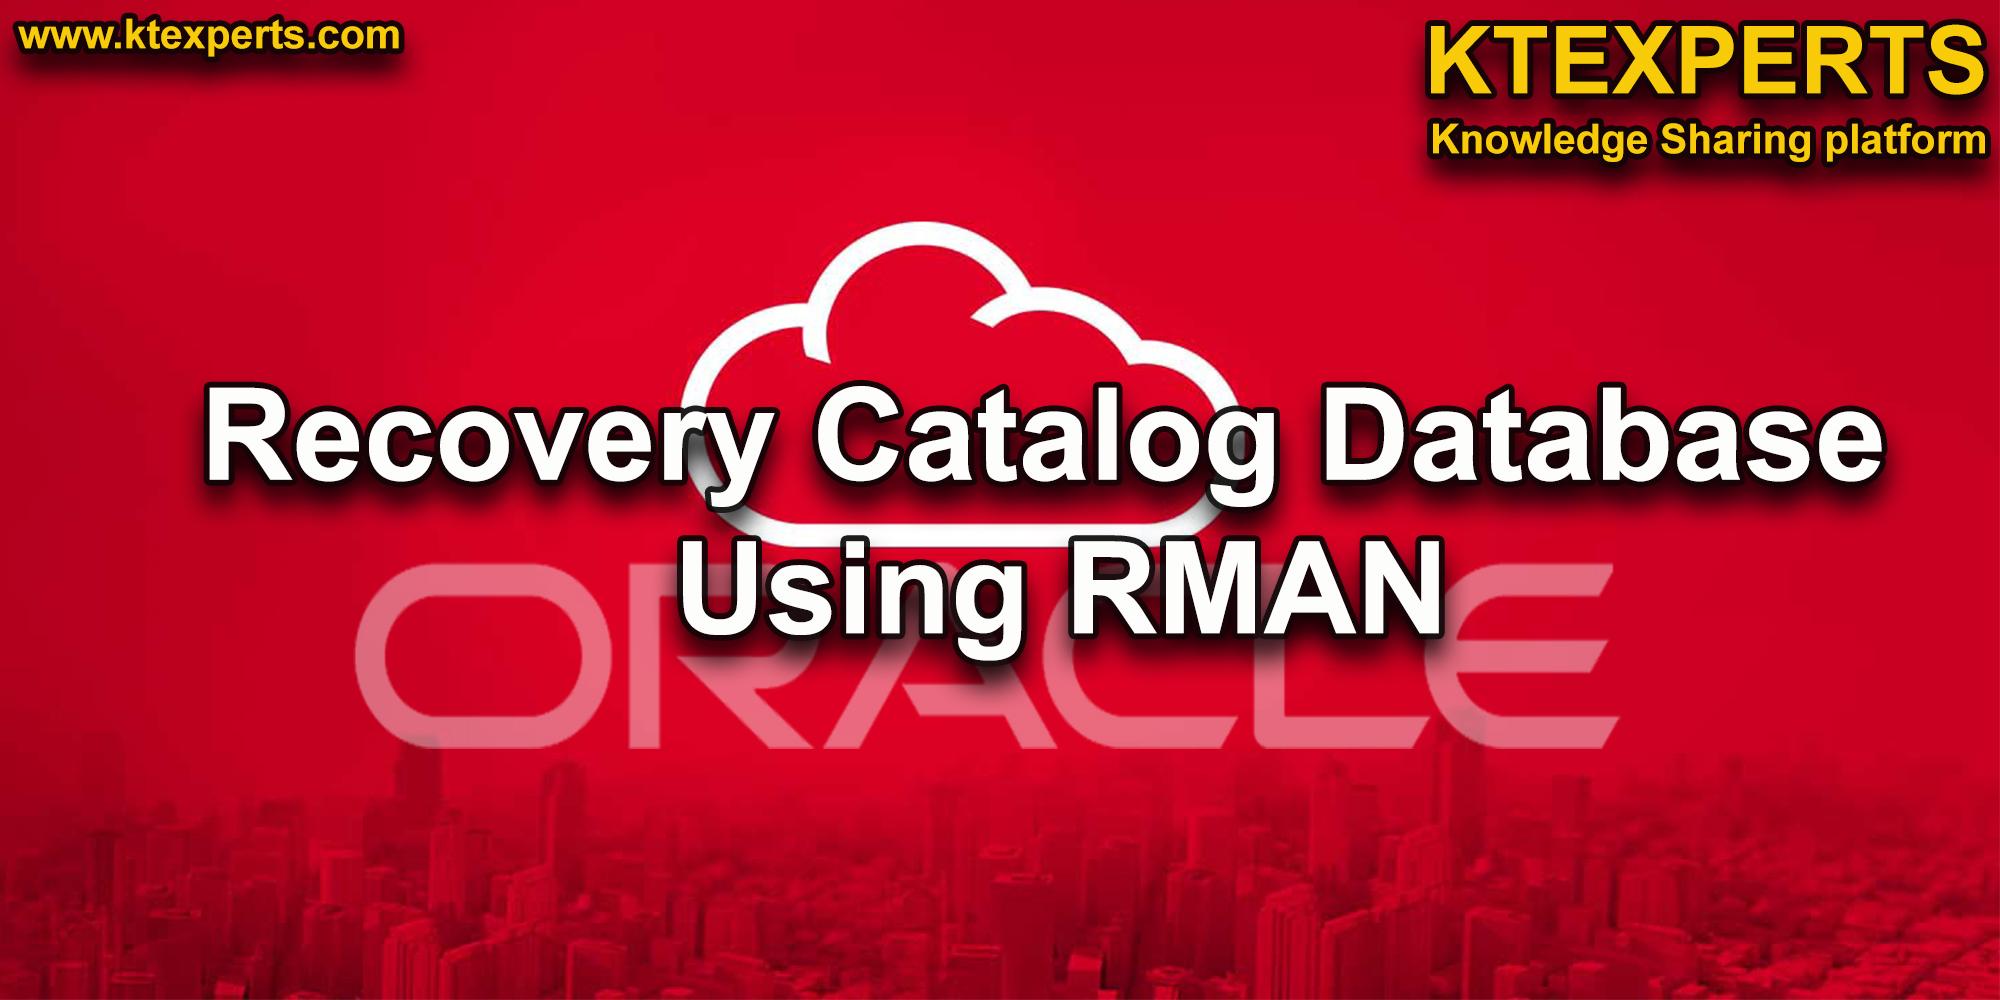 Recovery Catalog Database Using RMAN